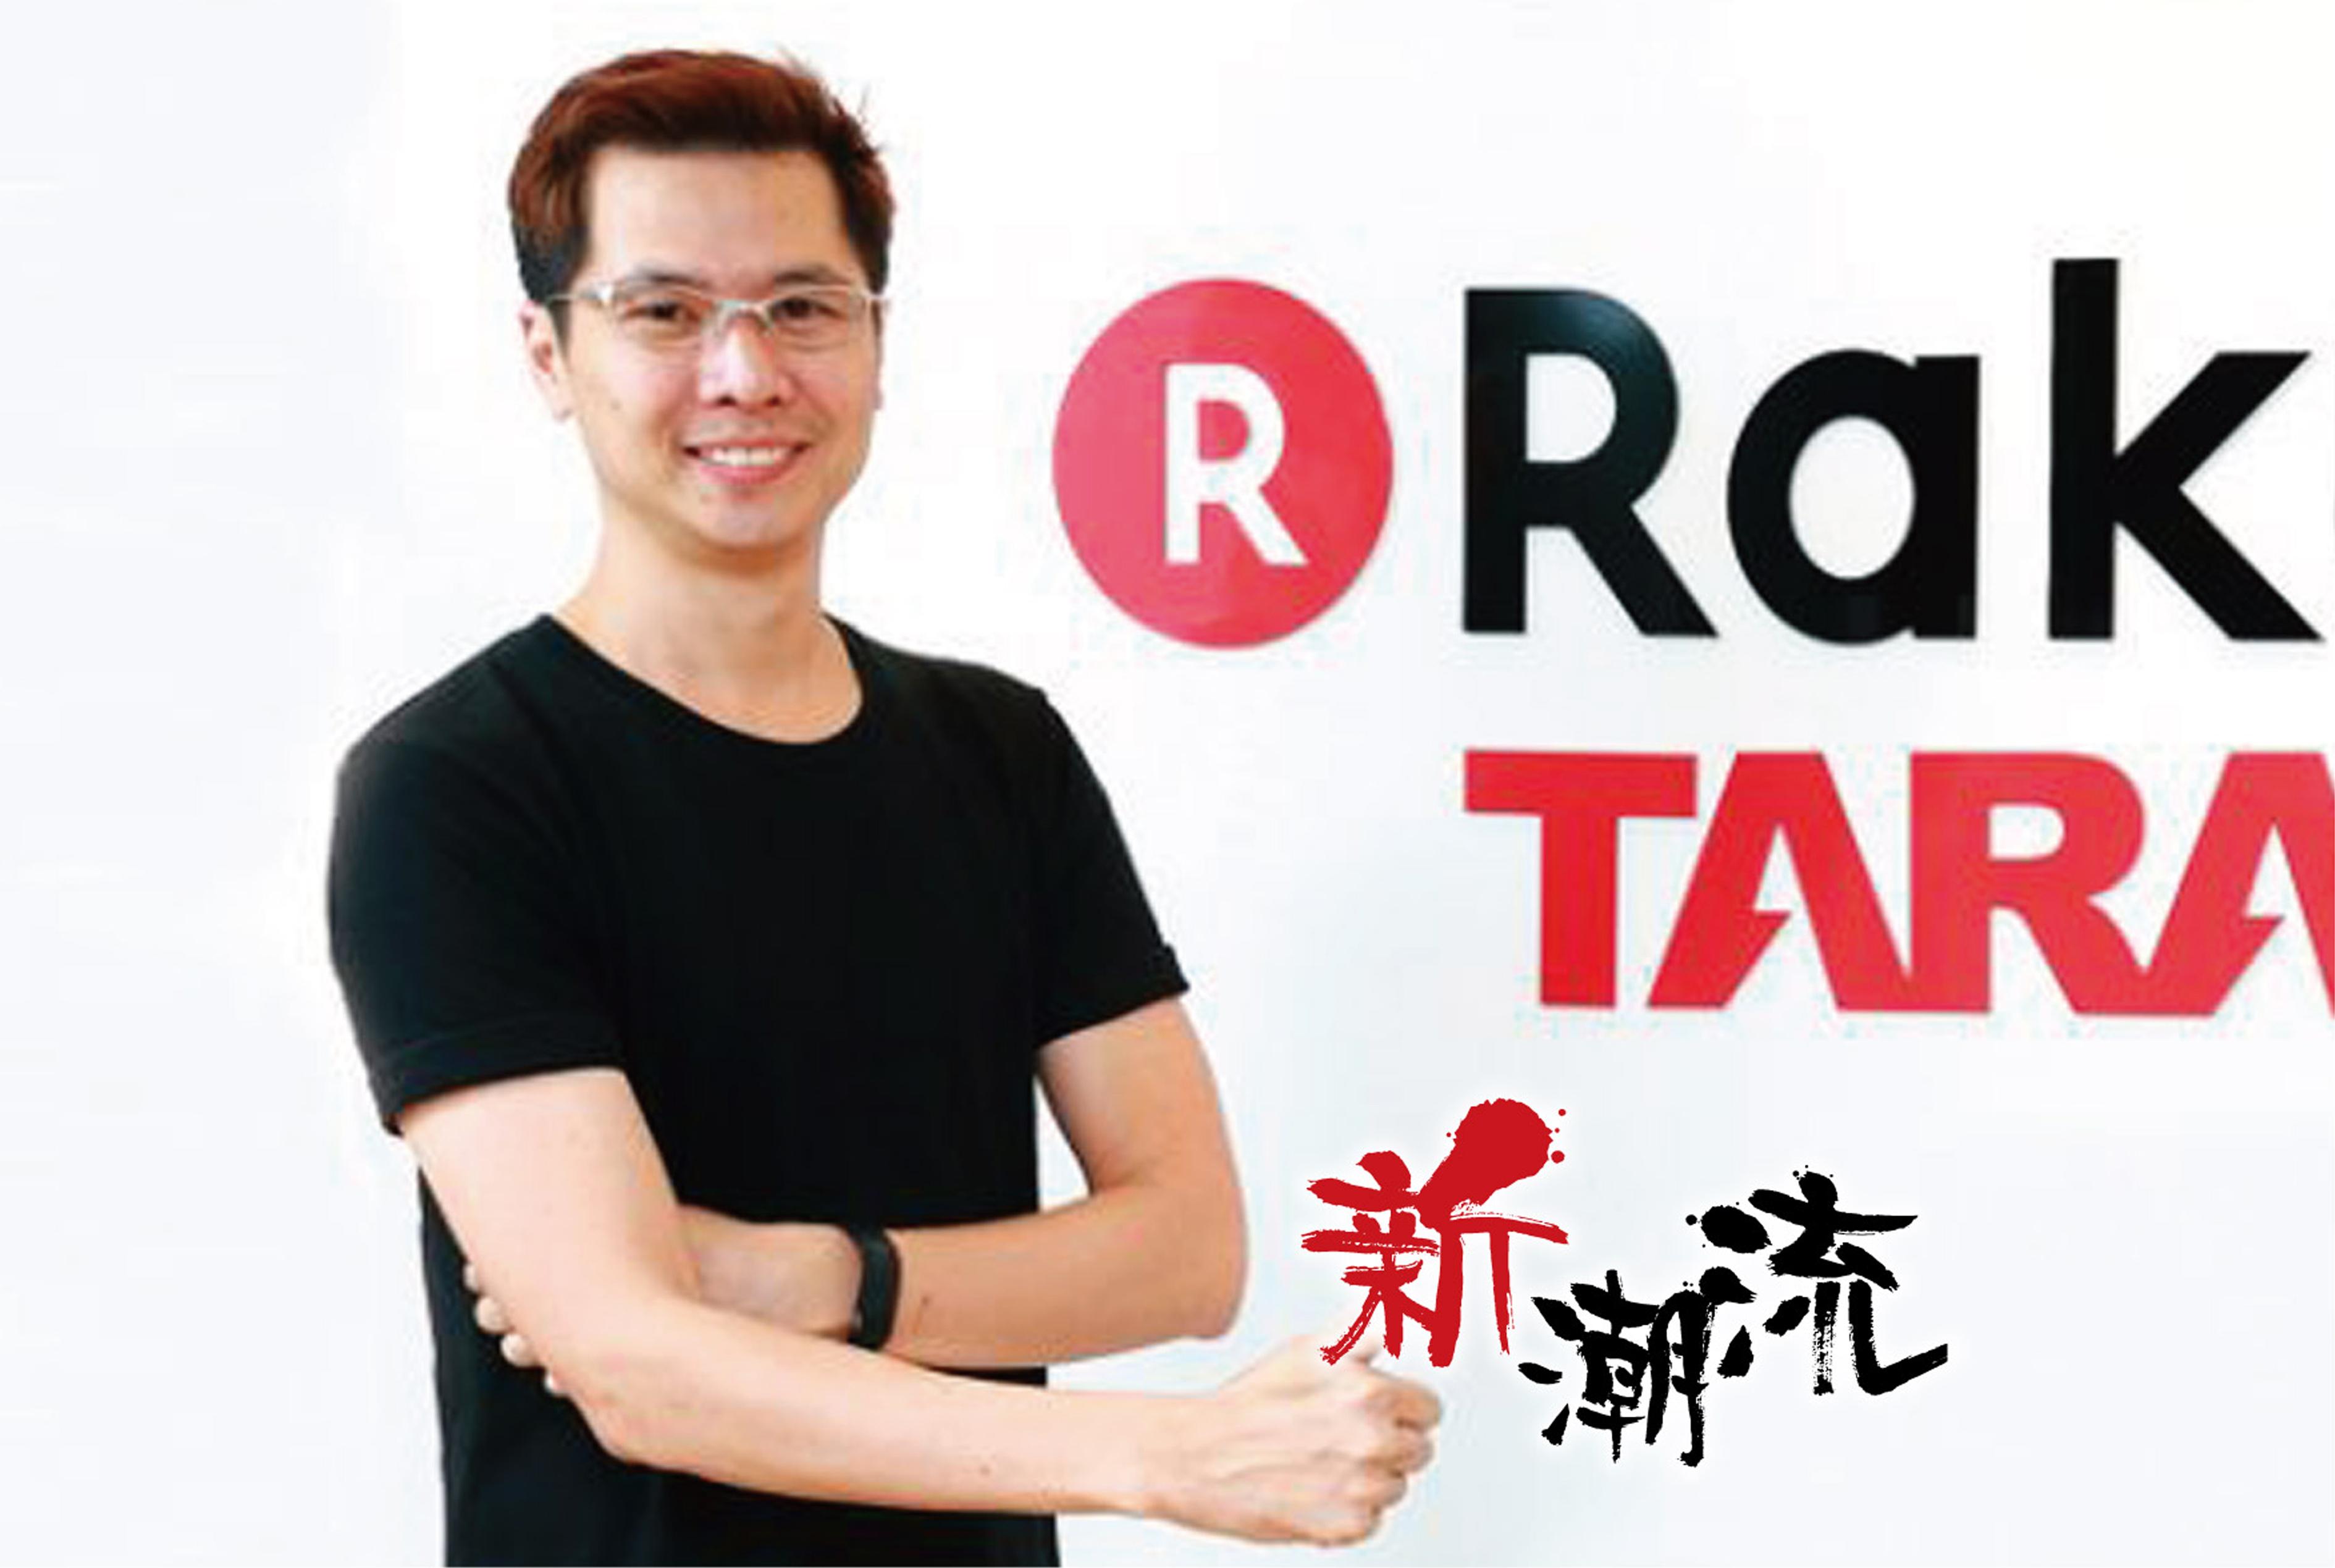 TARAD Dot Com Co., Ltd. - ワイズデジタル【タイで生活する人のための情報サイト】